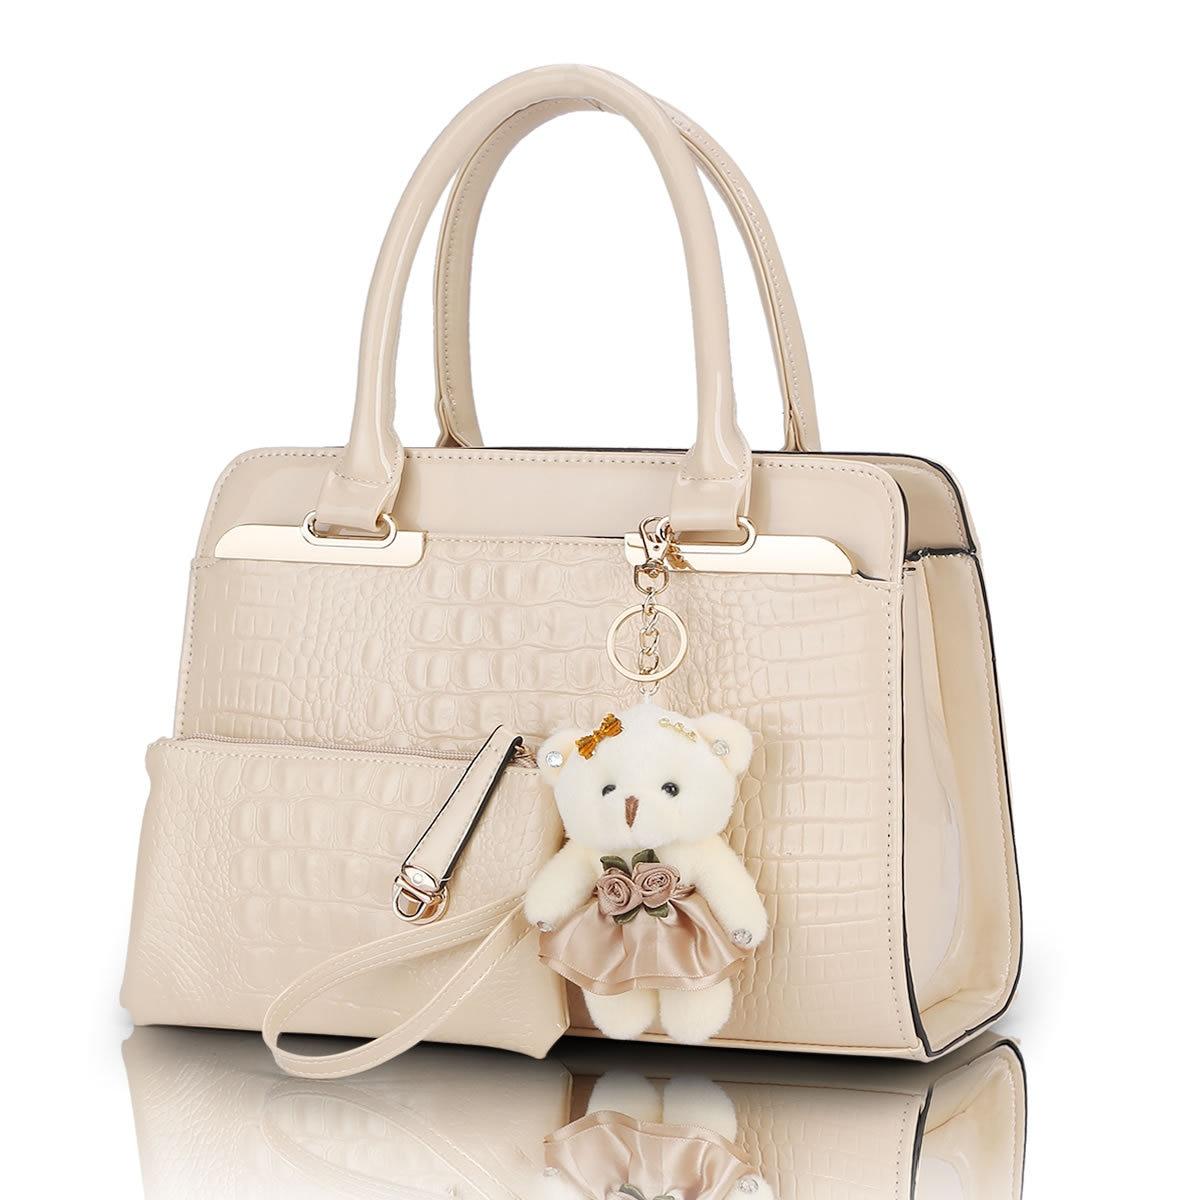 7494b81ff00c Fashion PU Patent Leather Women Shoulder Bags Elegant Alligator Pattern  Women Messenger Bags bolsos 2 bags